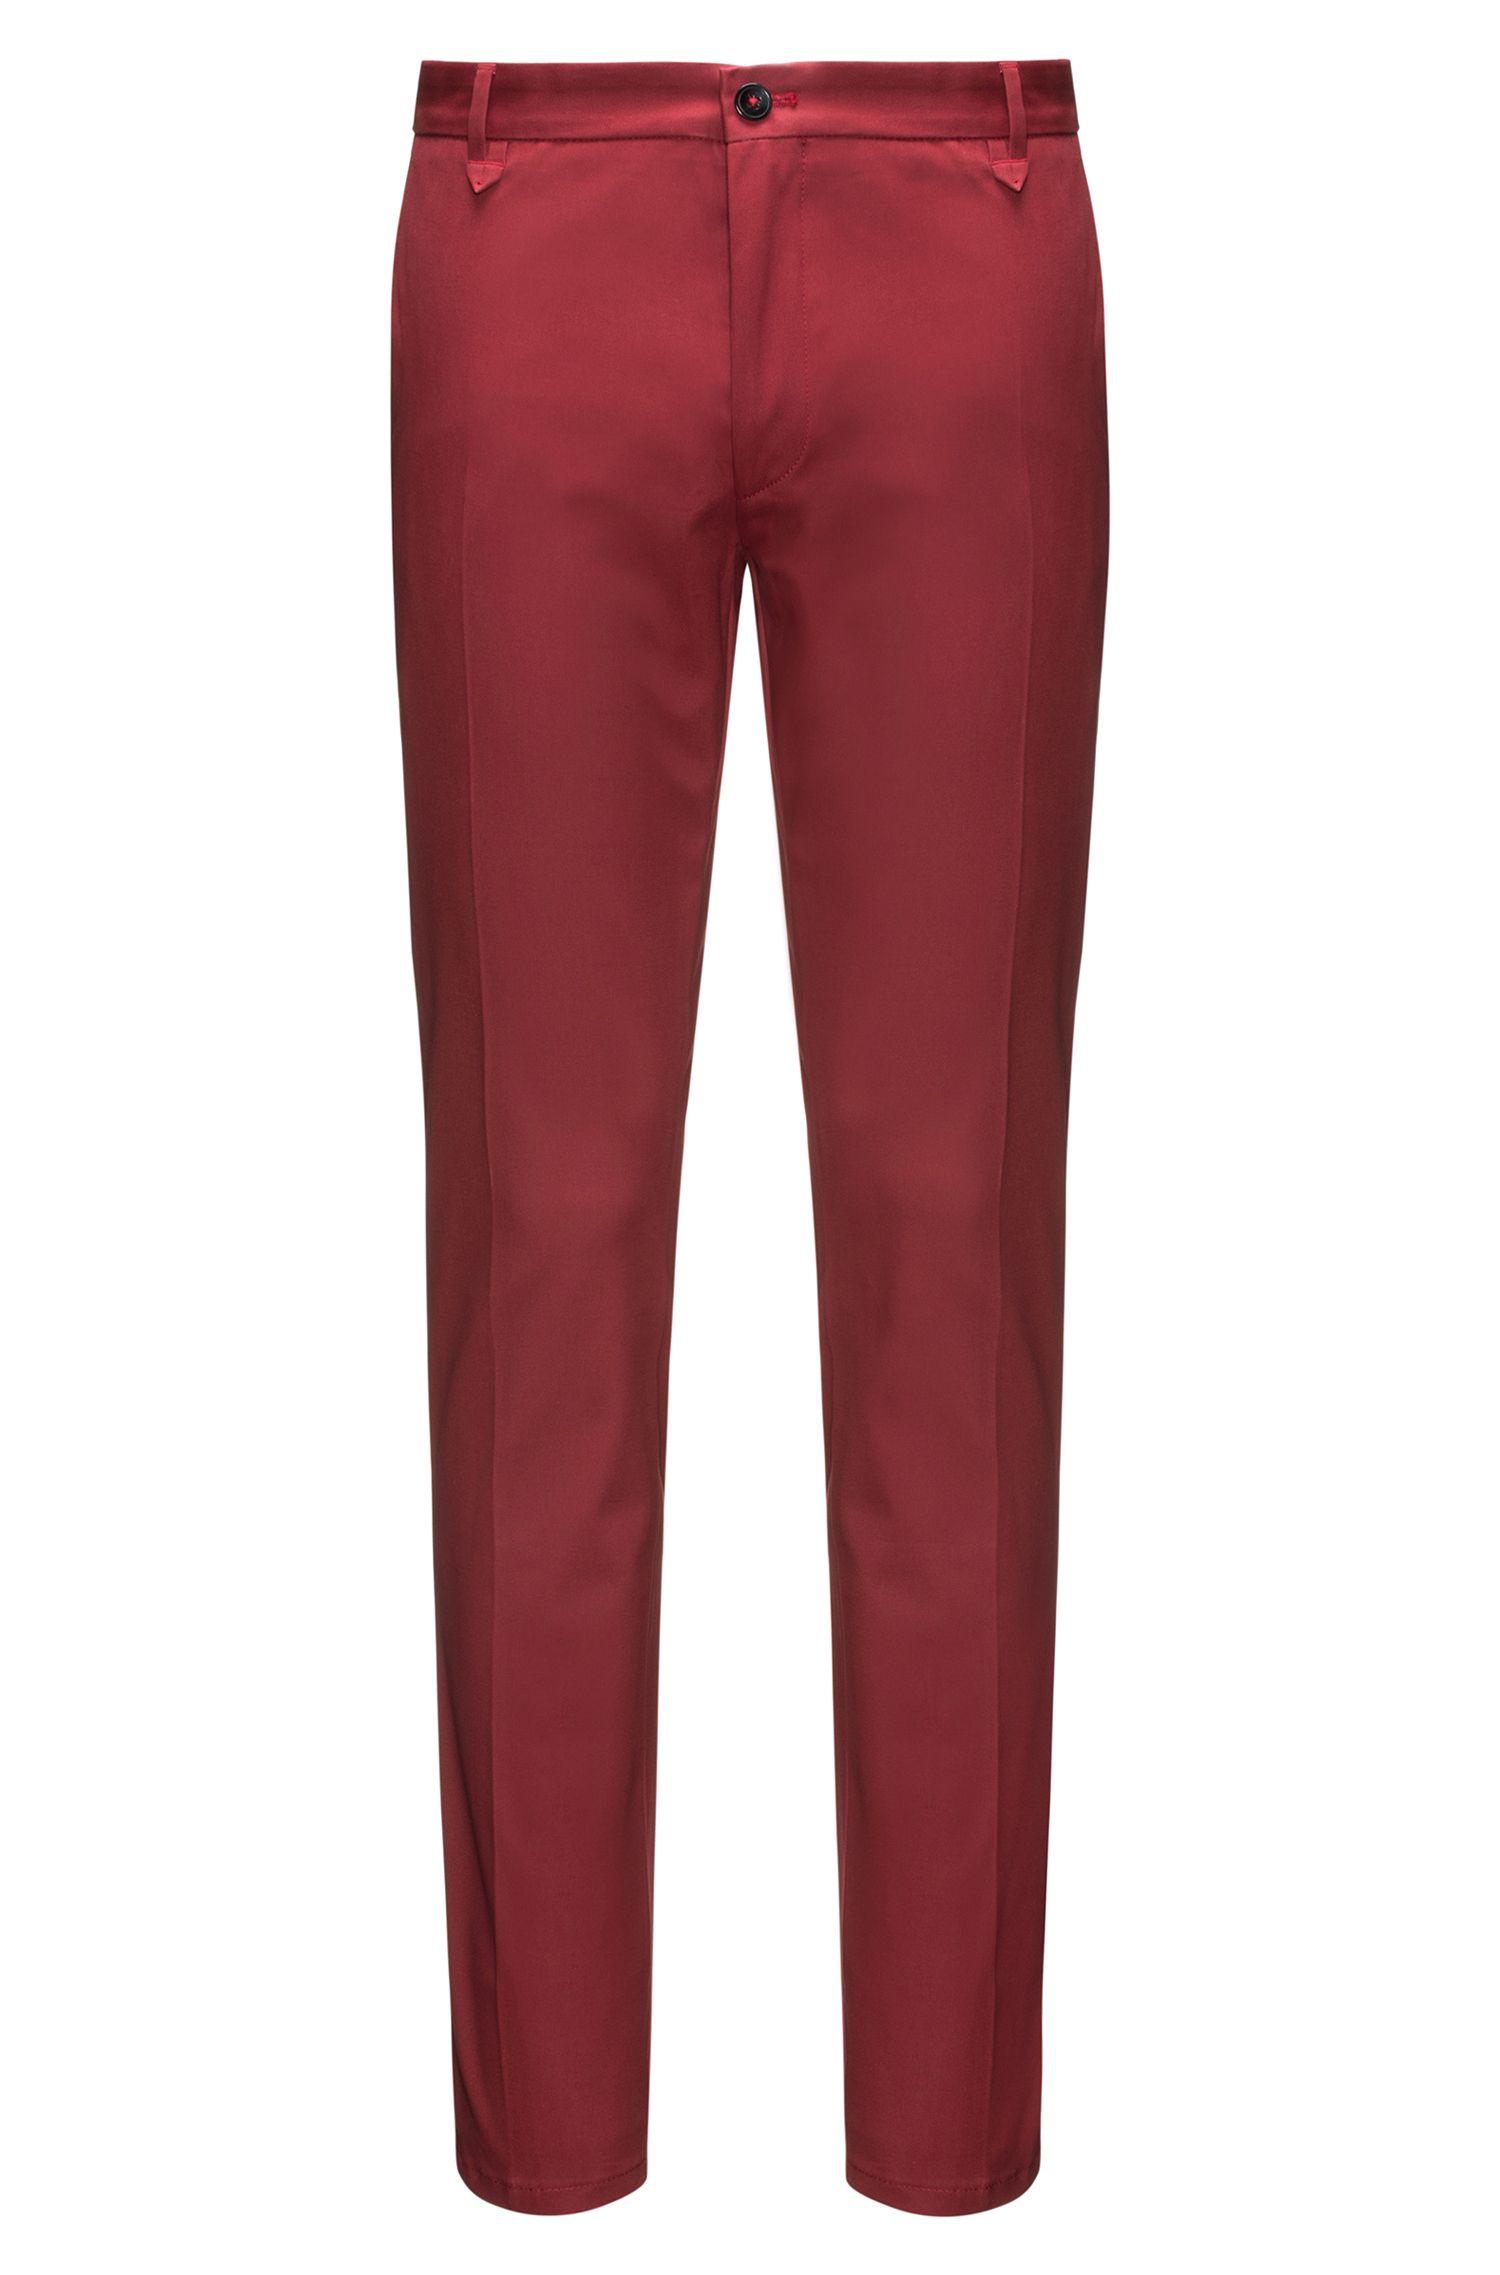 Stretch Gabardine Pant, Extra-Slim Fit | Heldor